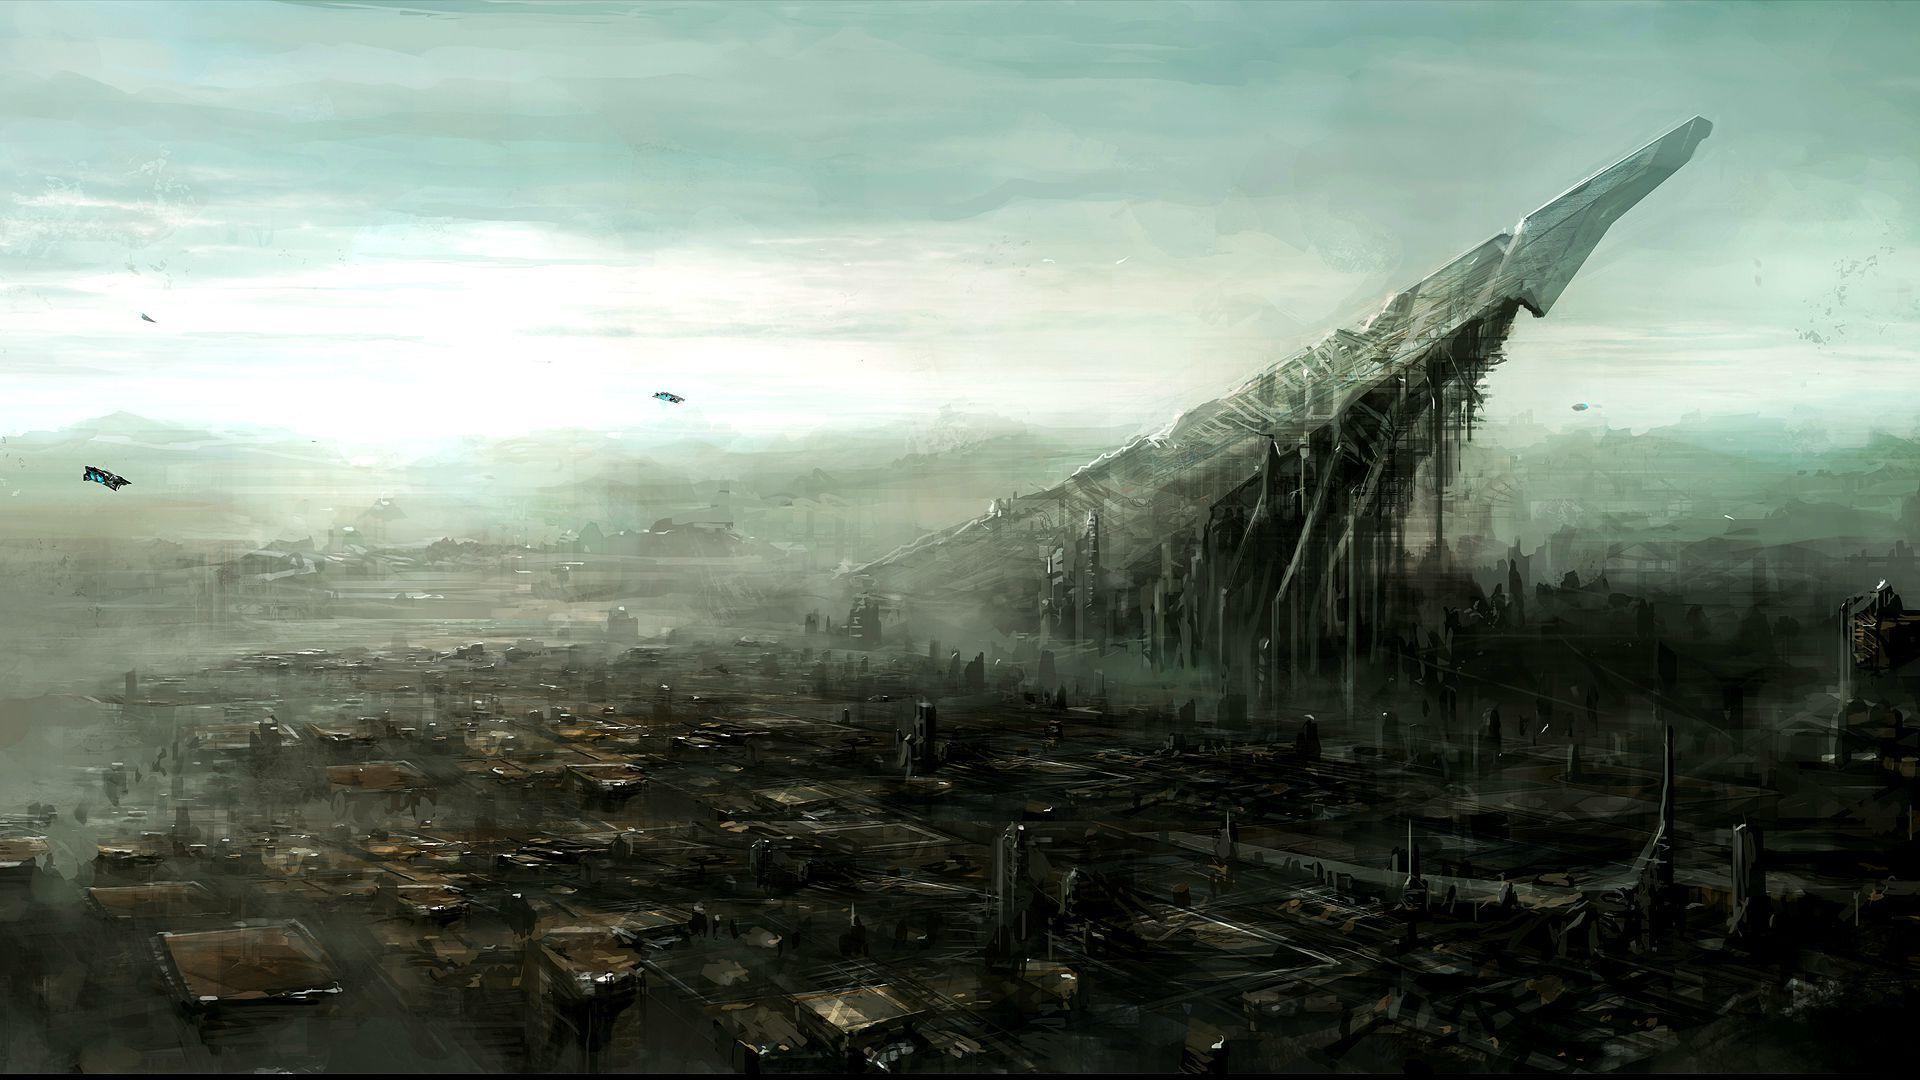 Sci fi landscape wallpaper   1207228 1920x1080